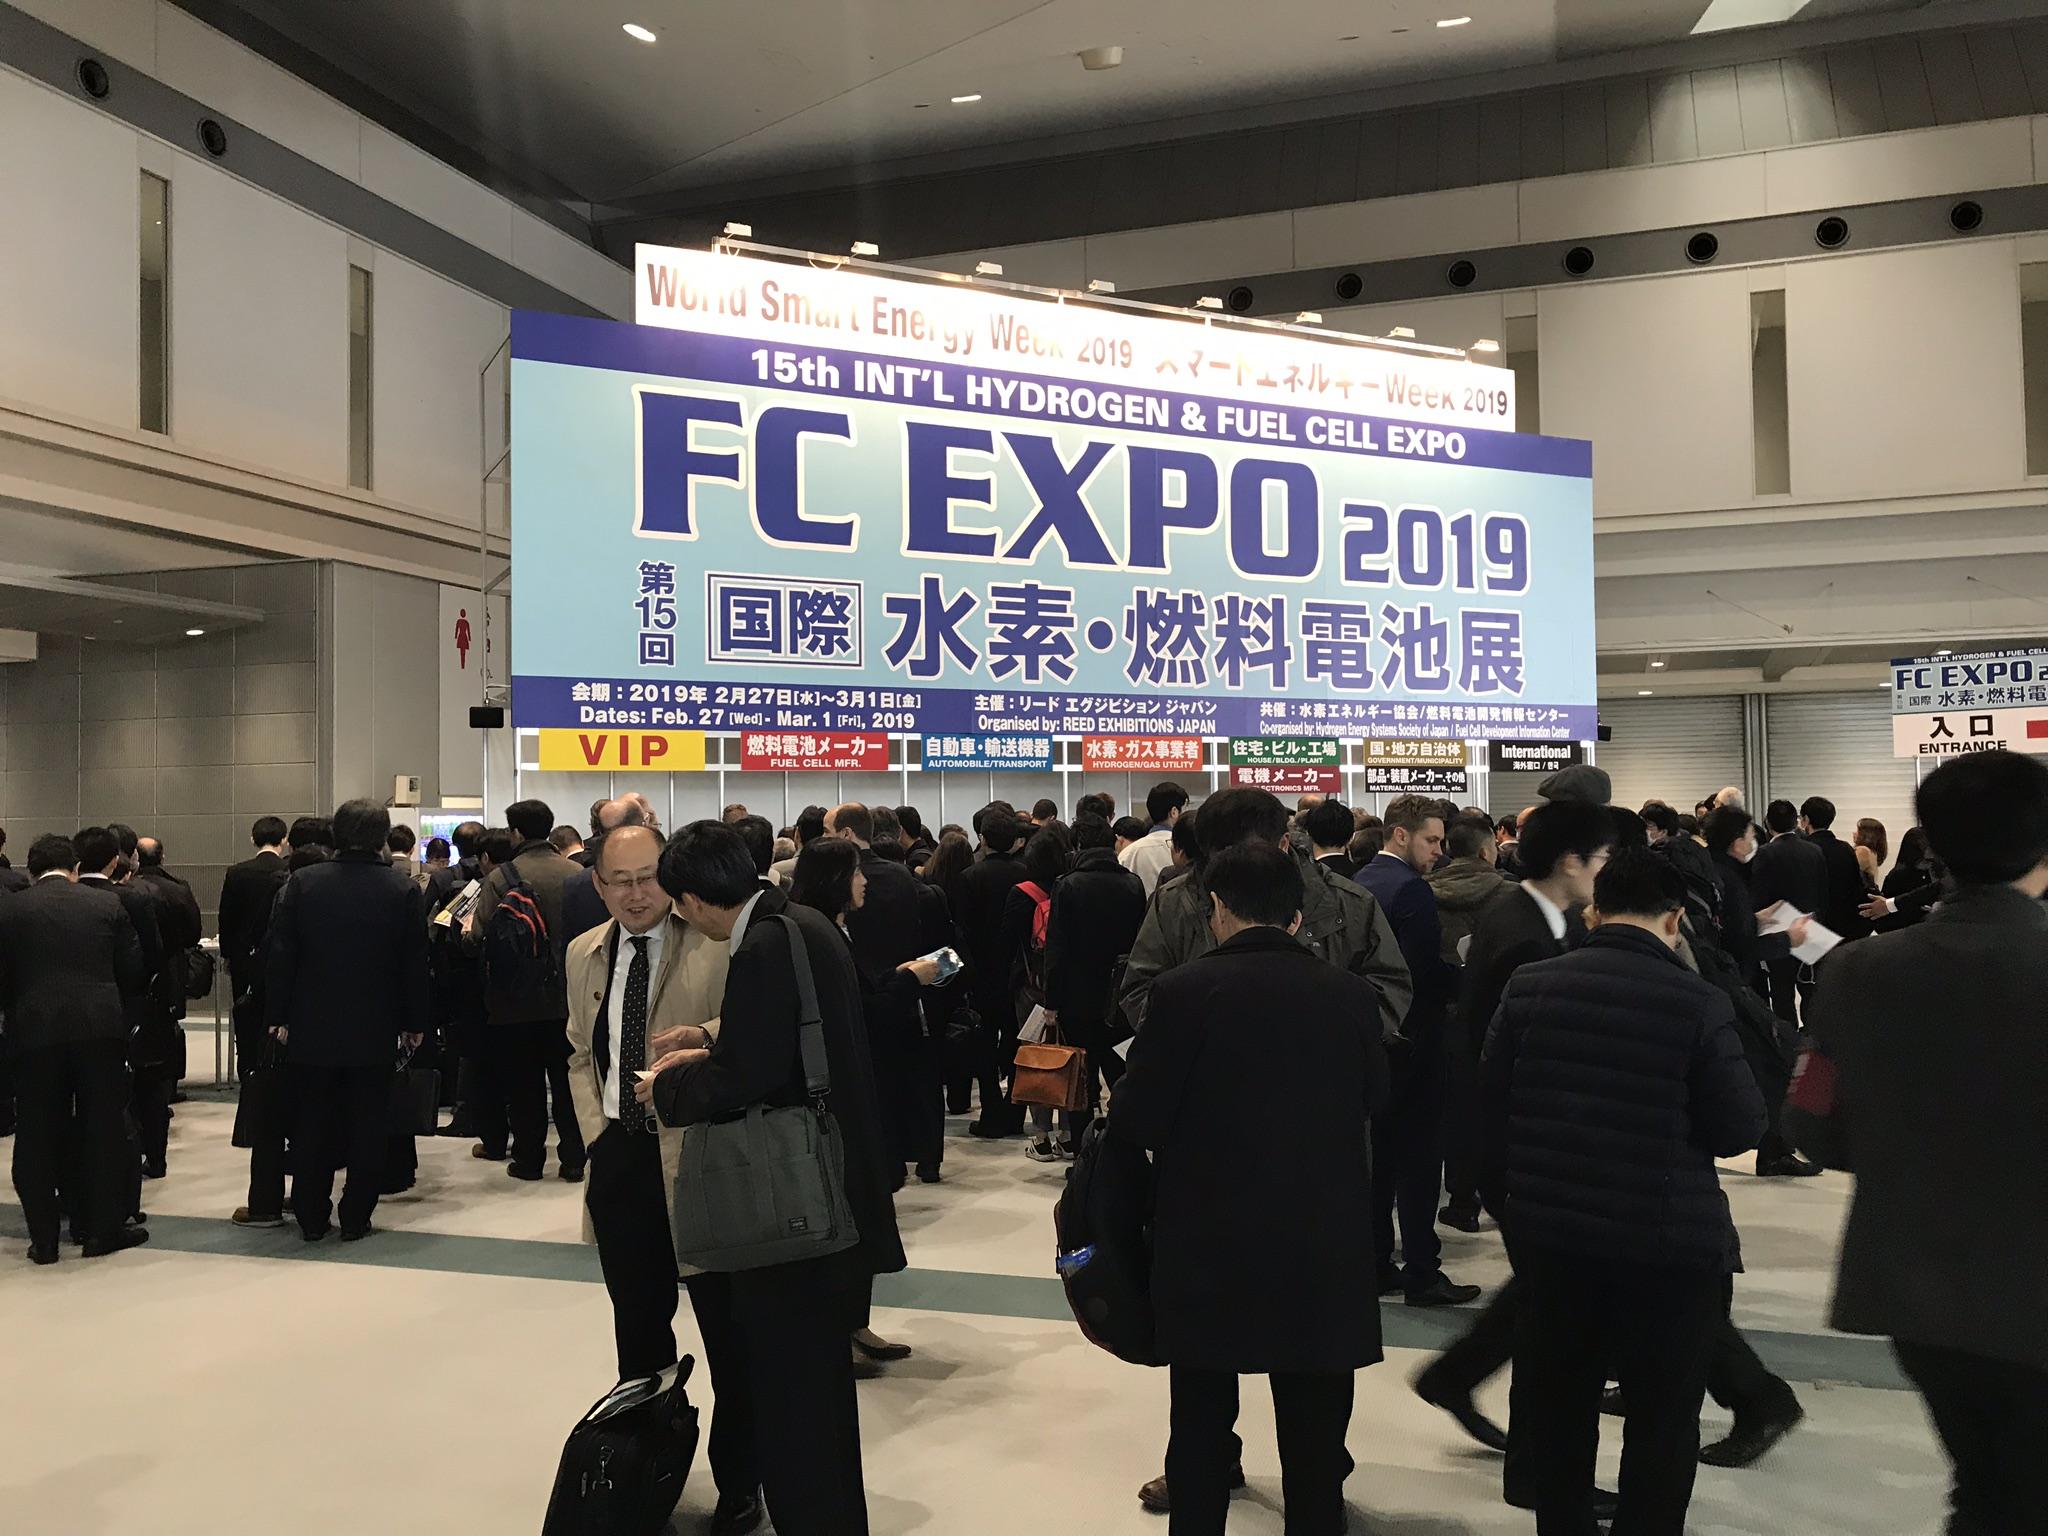 FC EXPO 2020 - 第十六届日本国际氢能及燃料电池展